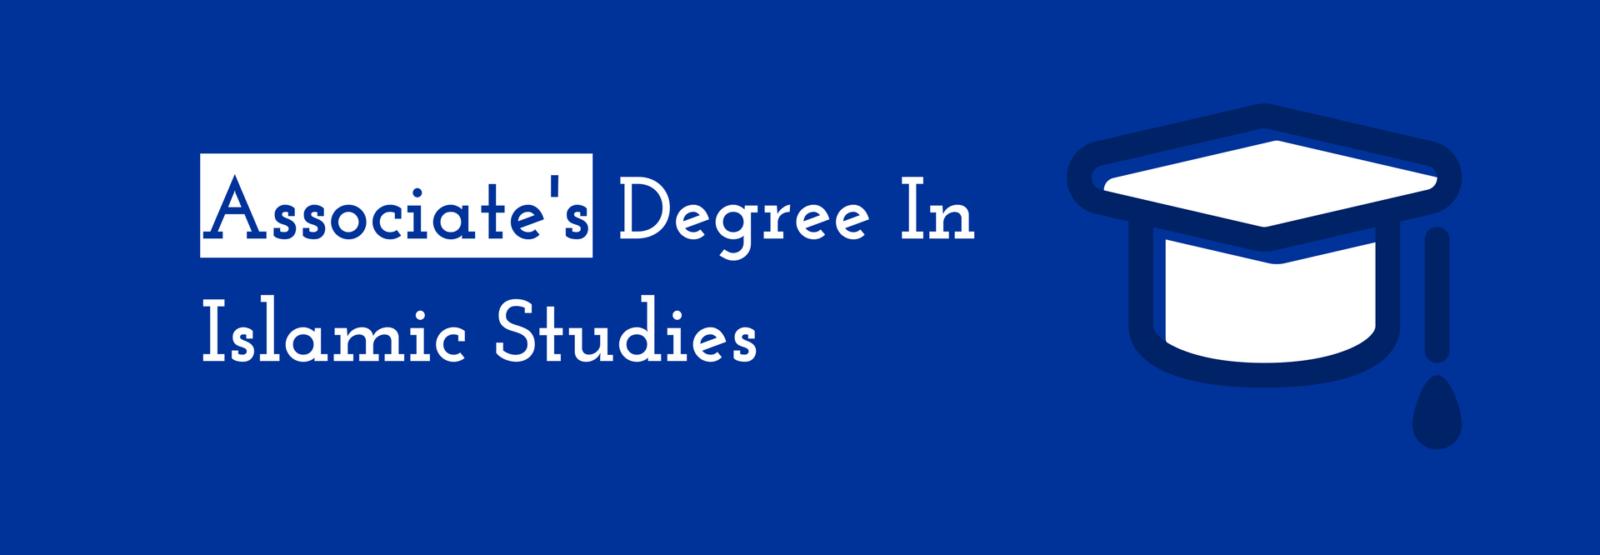 Associate's Degree In Islamic Studies